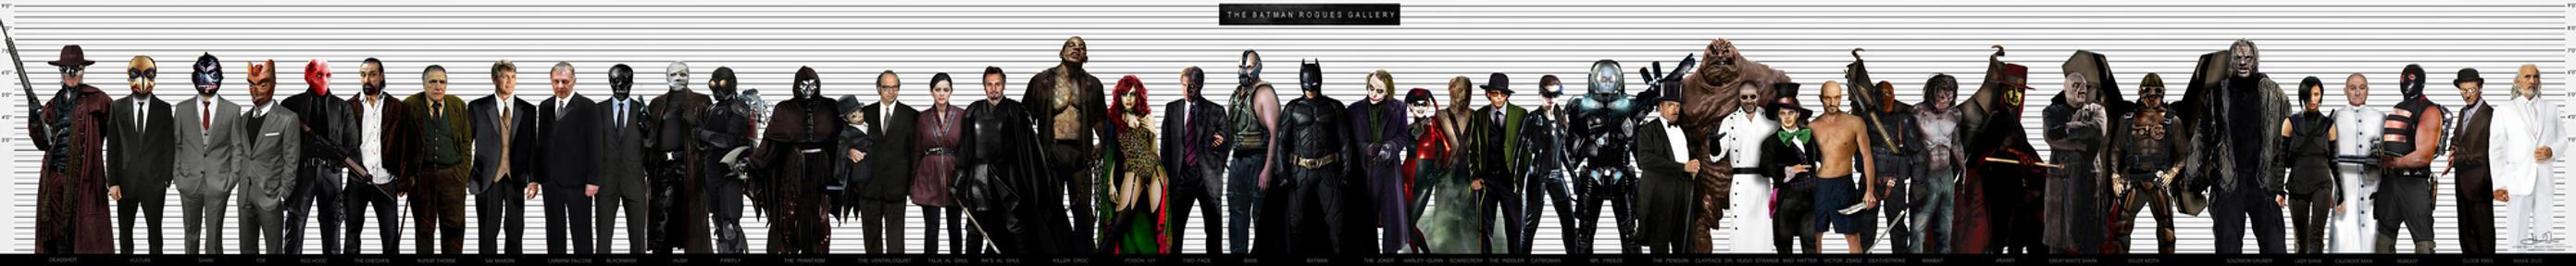 BATMAN ROGUES GALLERY by Art-by-Jilani